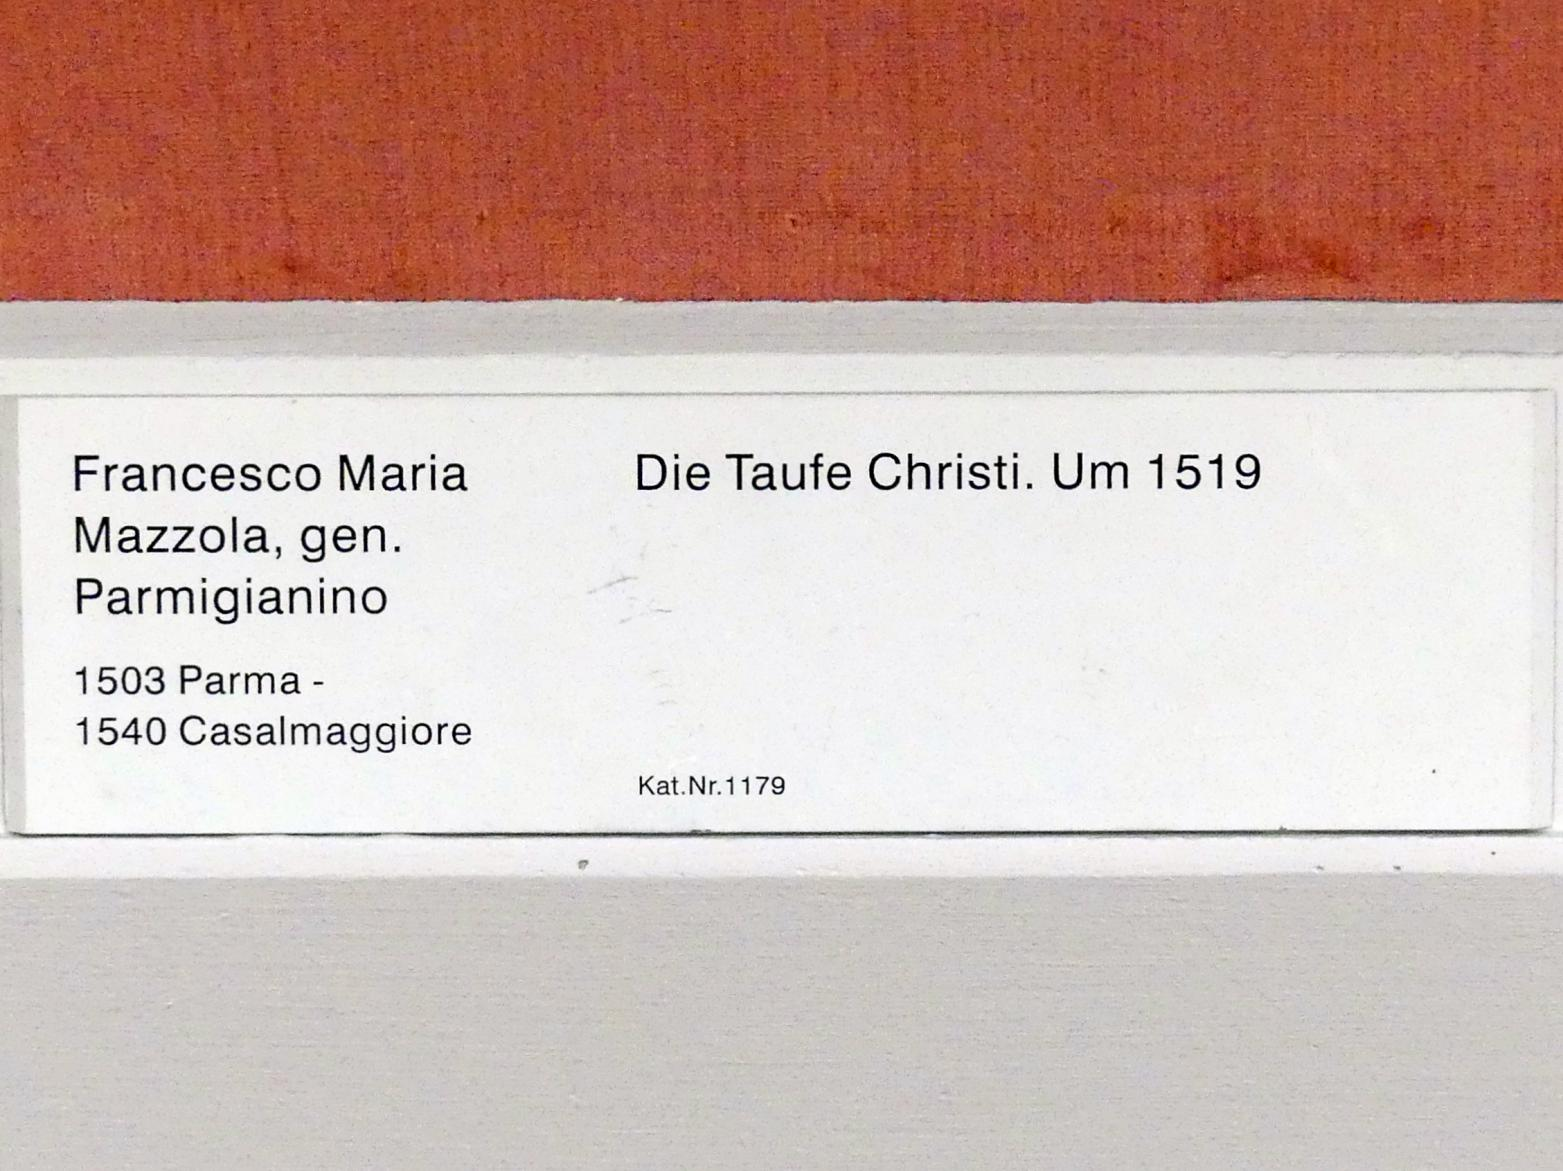 Parmigianino (Girolamo Francesco Maria Mazzola): Die Taufe Christi, um 1519, Bild 2/2